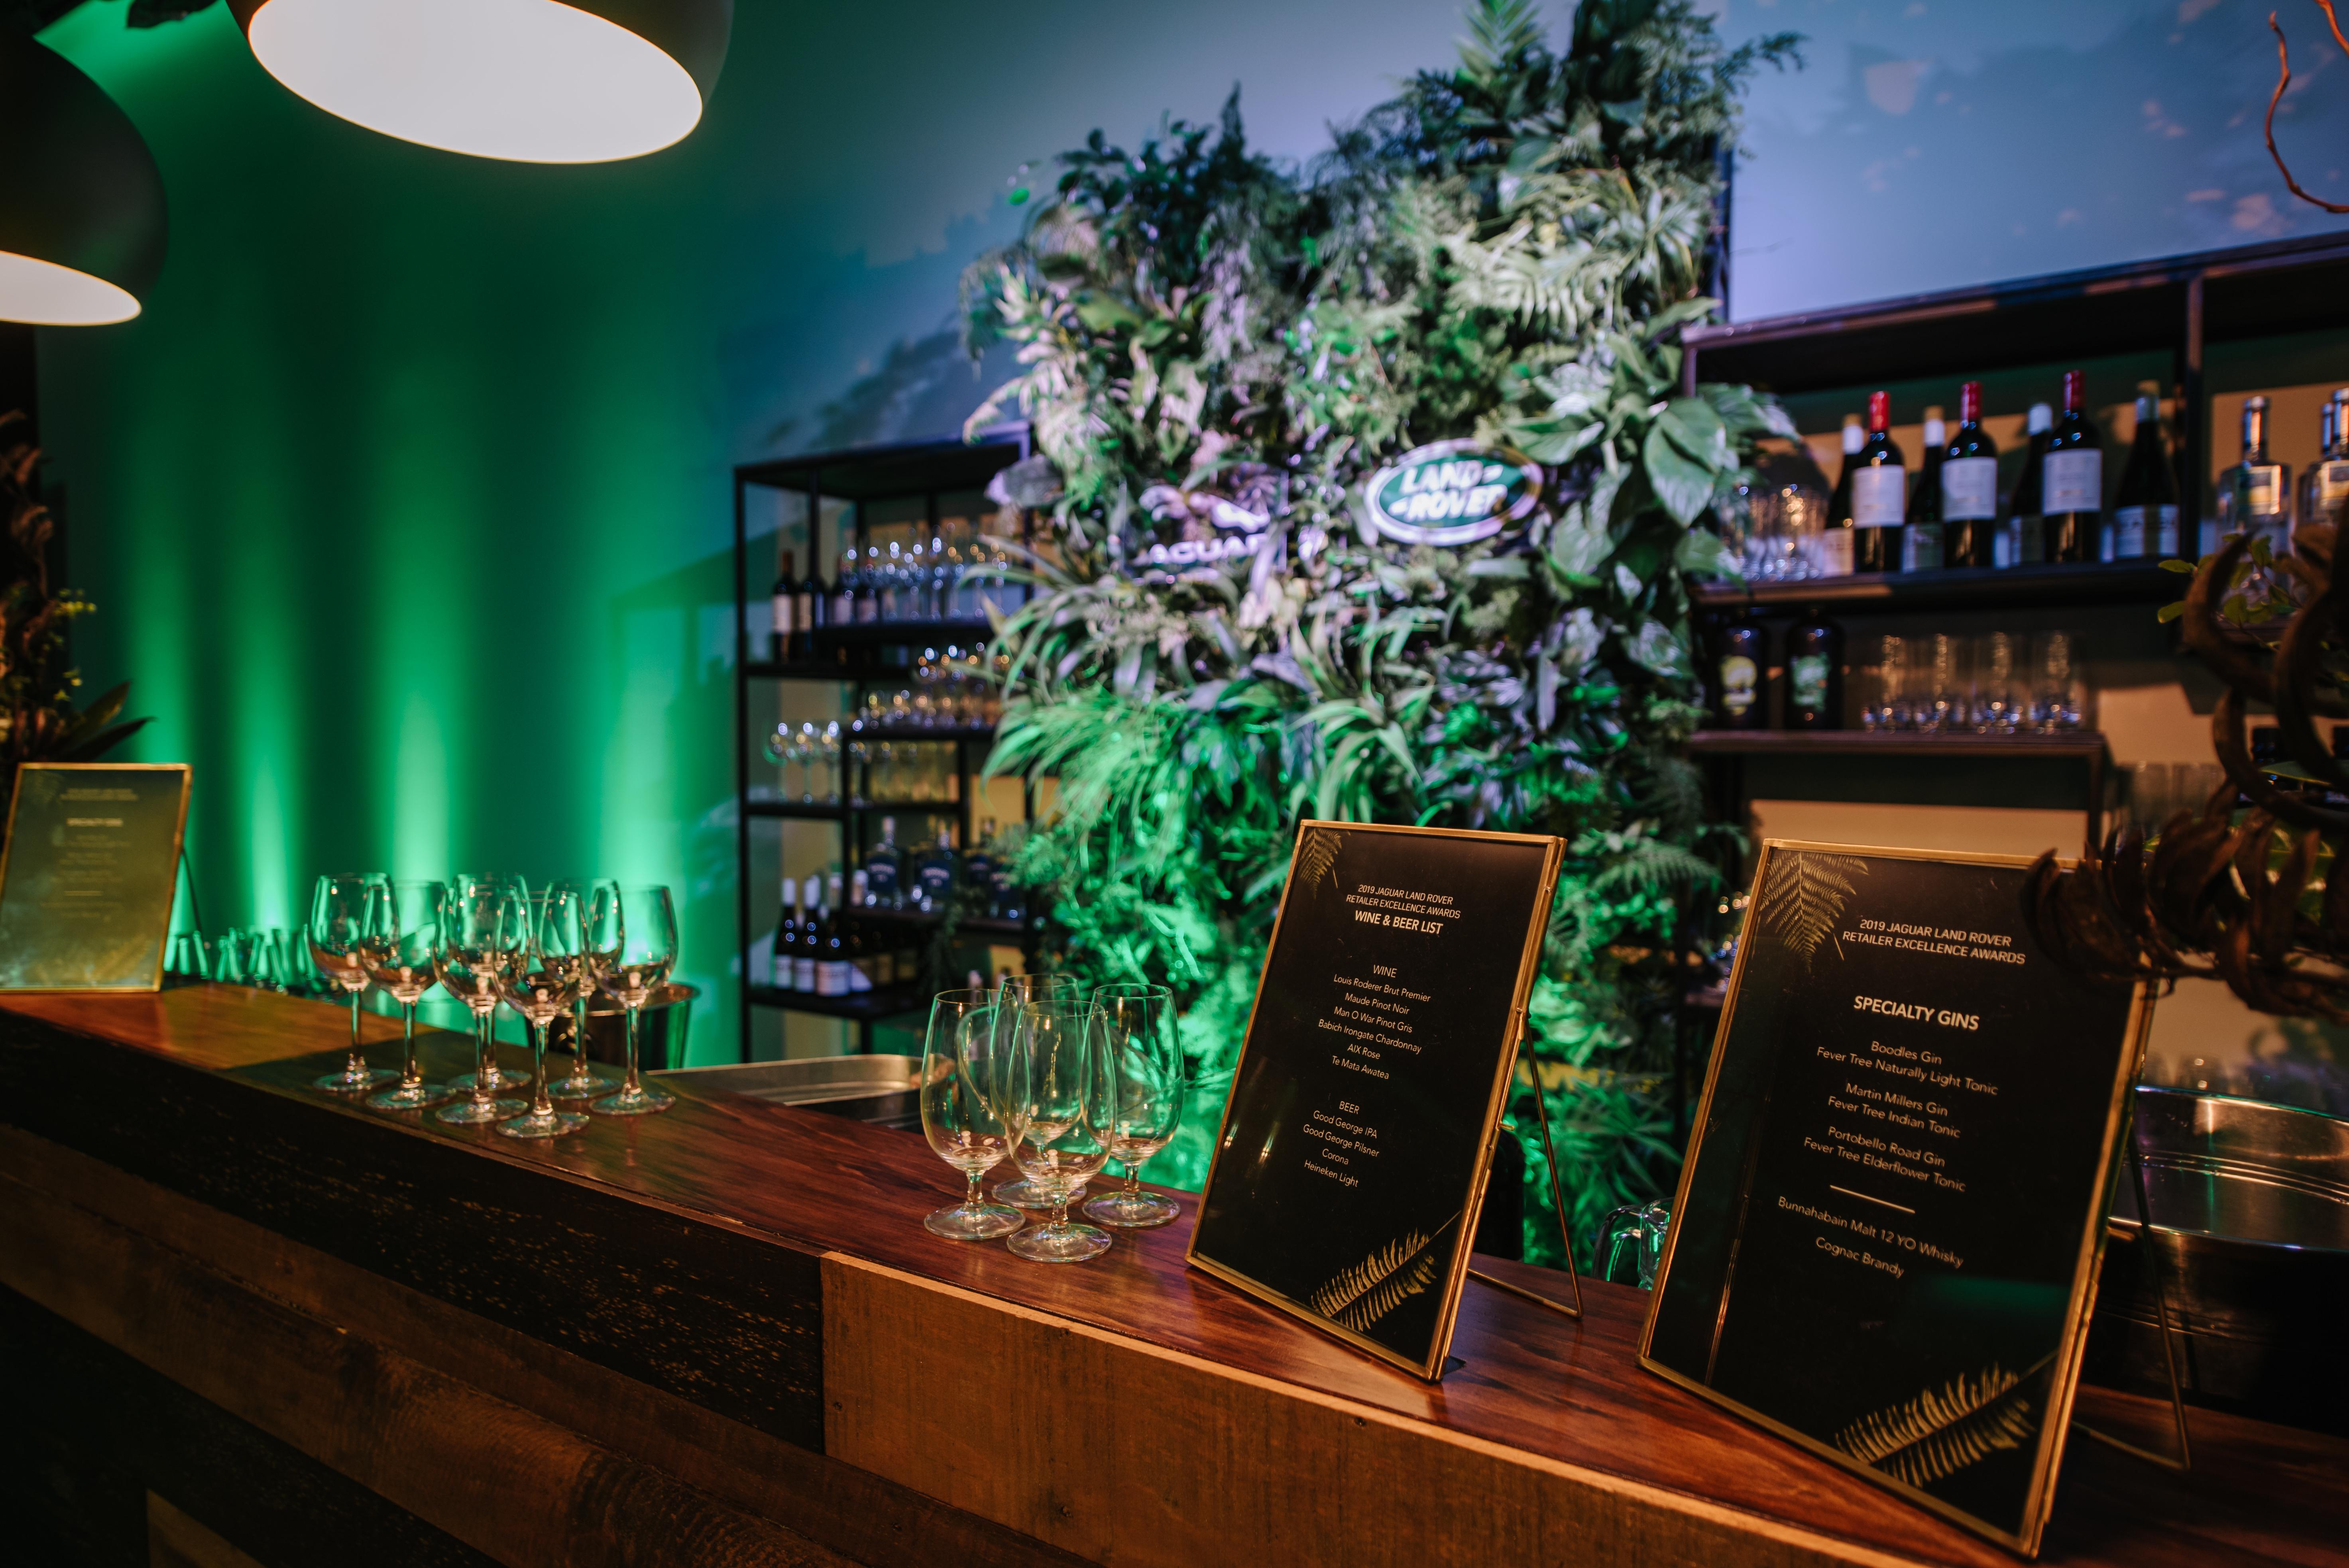 Auckland Event Design Activation Stands